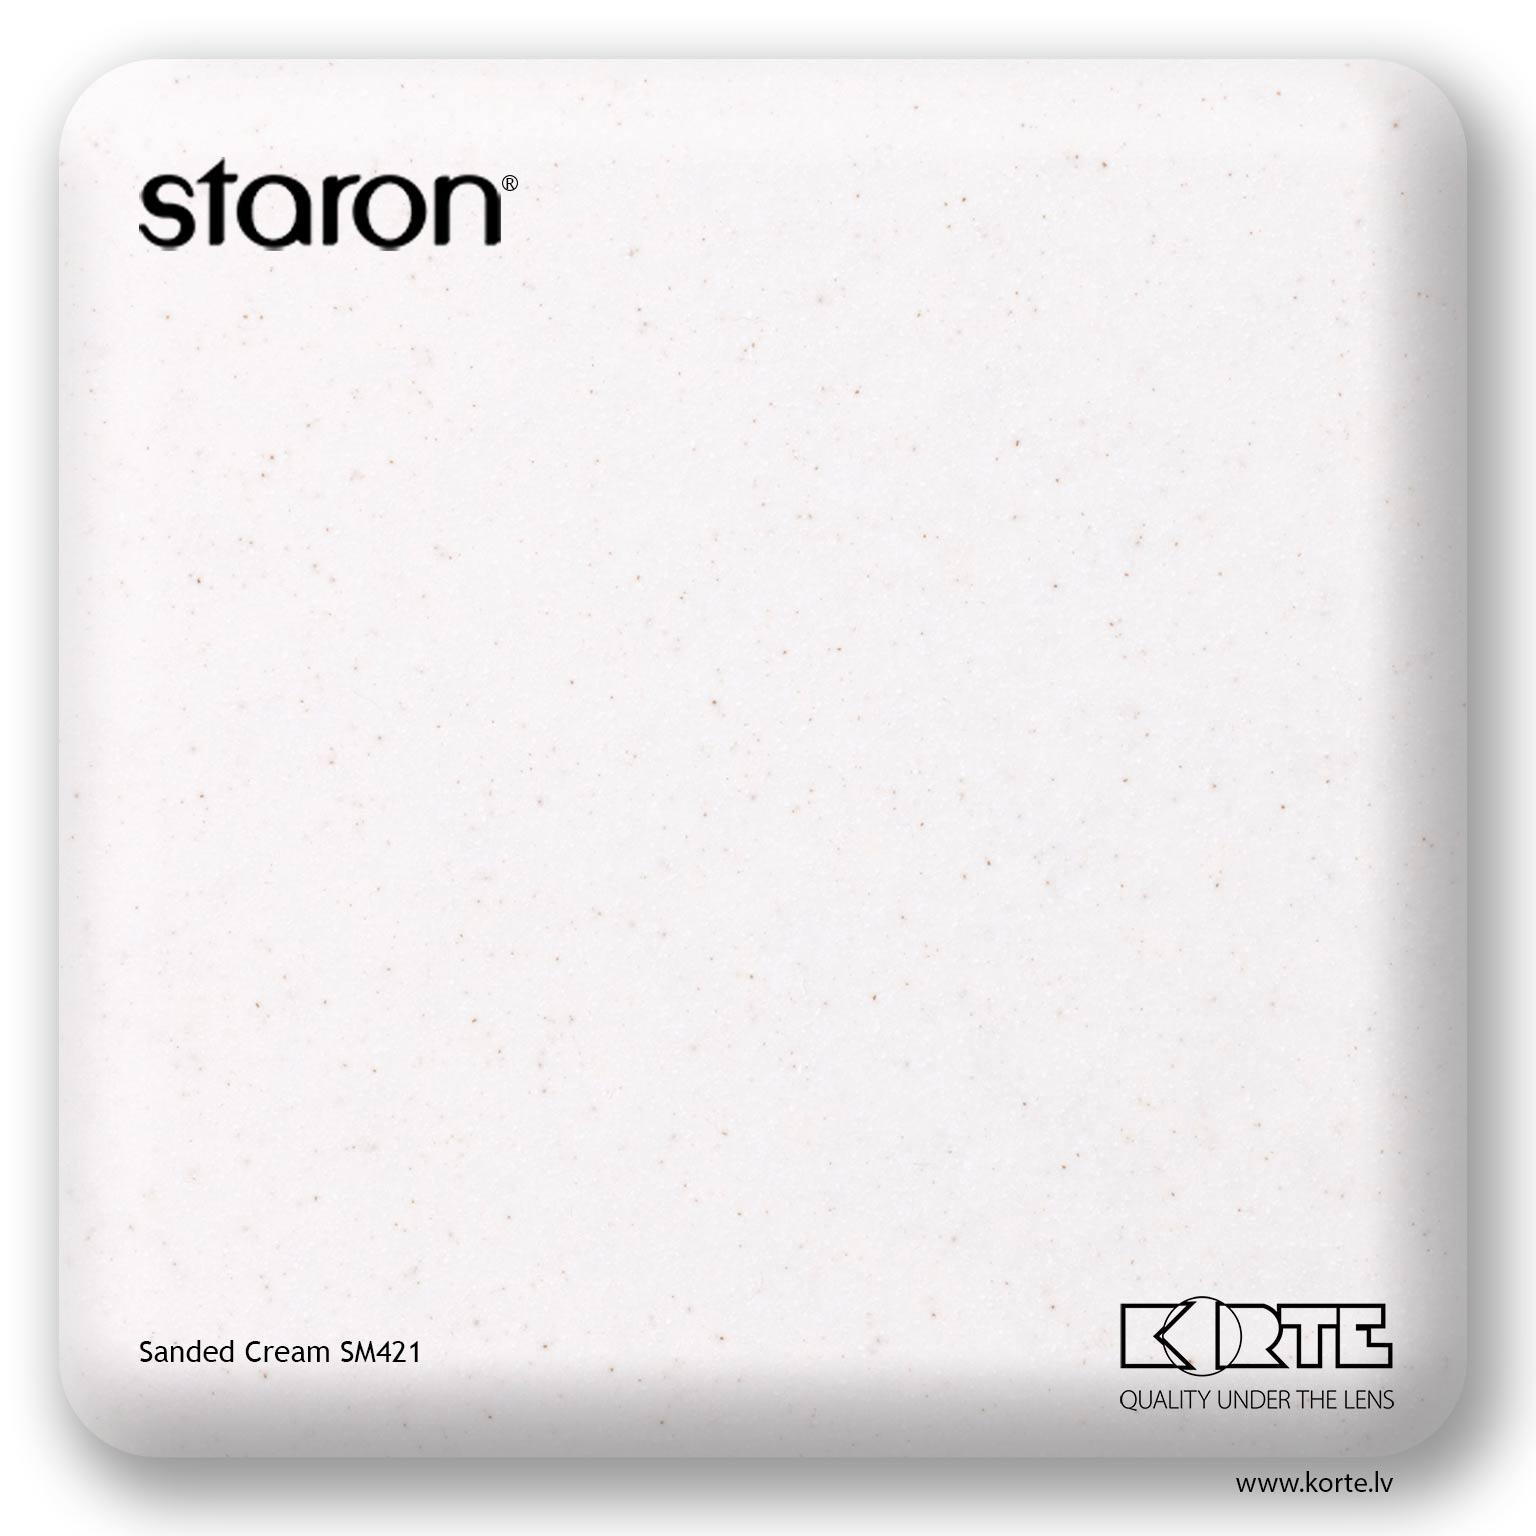 Staron Sanded Cream SM421